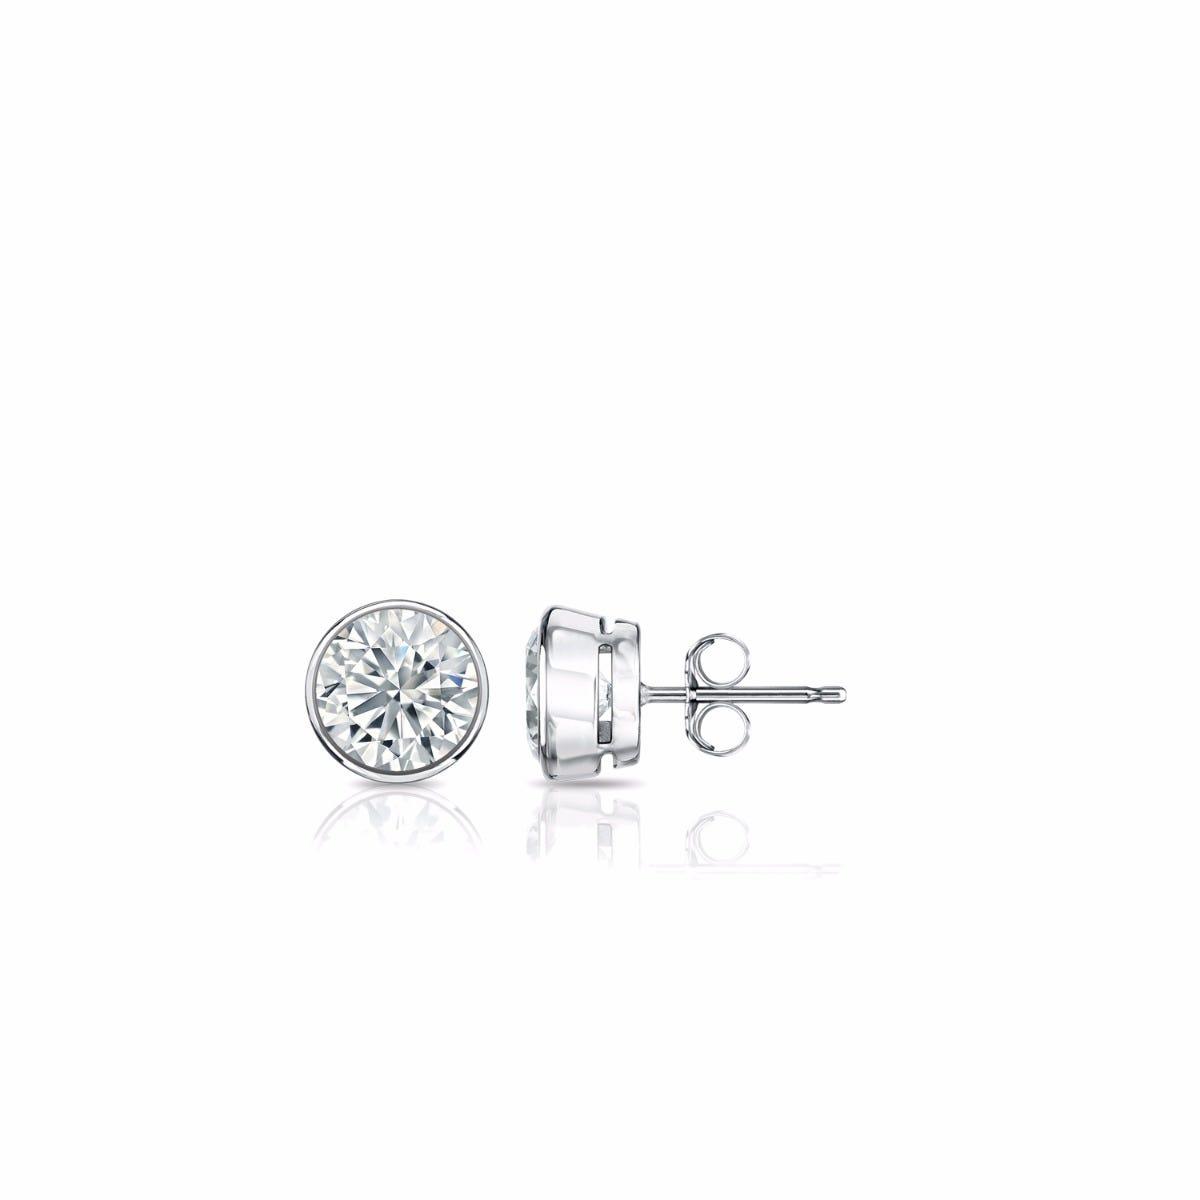 Bezel-Set Round 1/10ctw. Diamond Solitaire Stud Earrings (IJ, SI1) in 14K White Gold